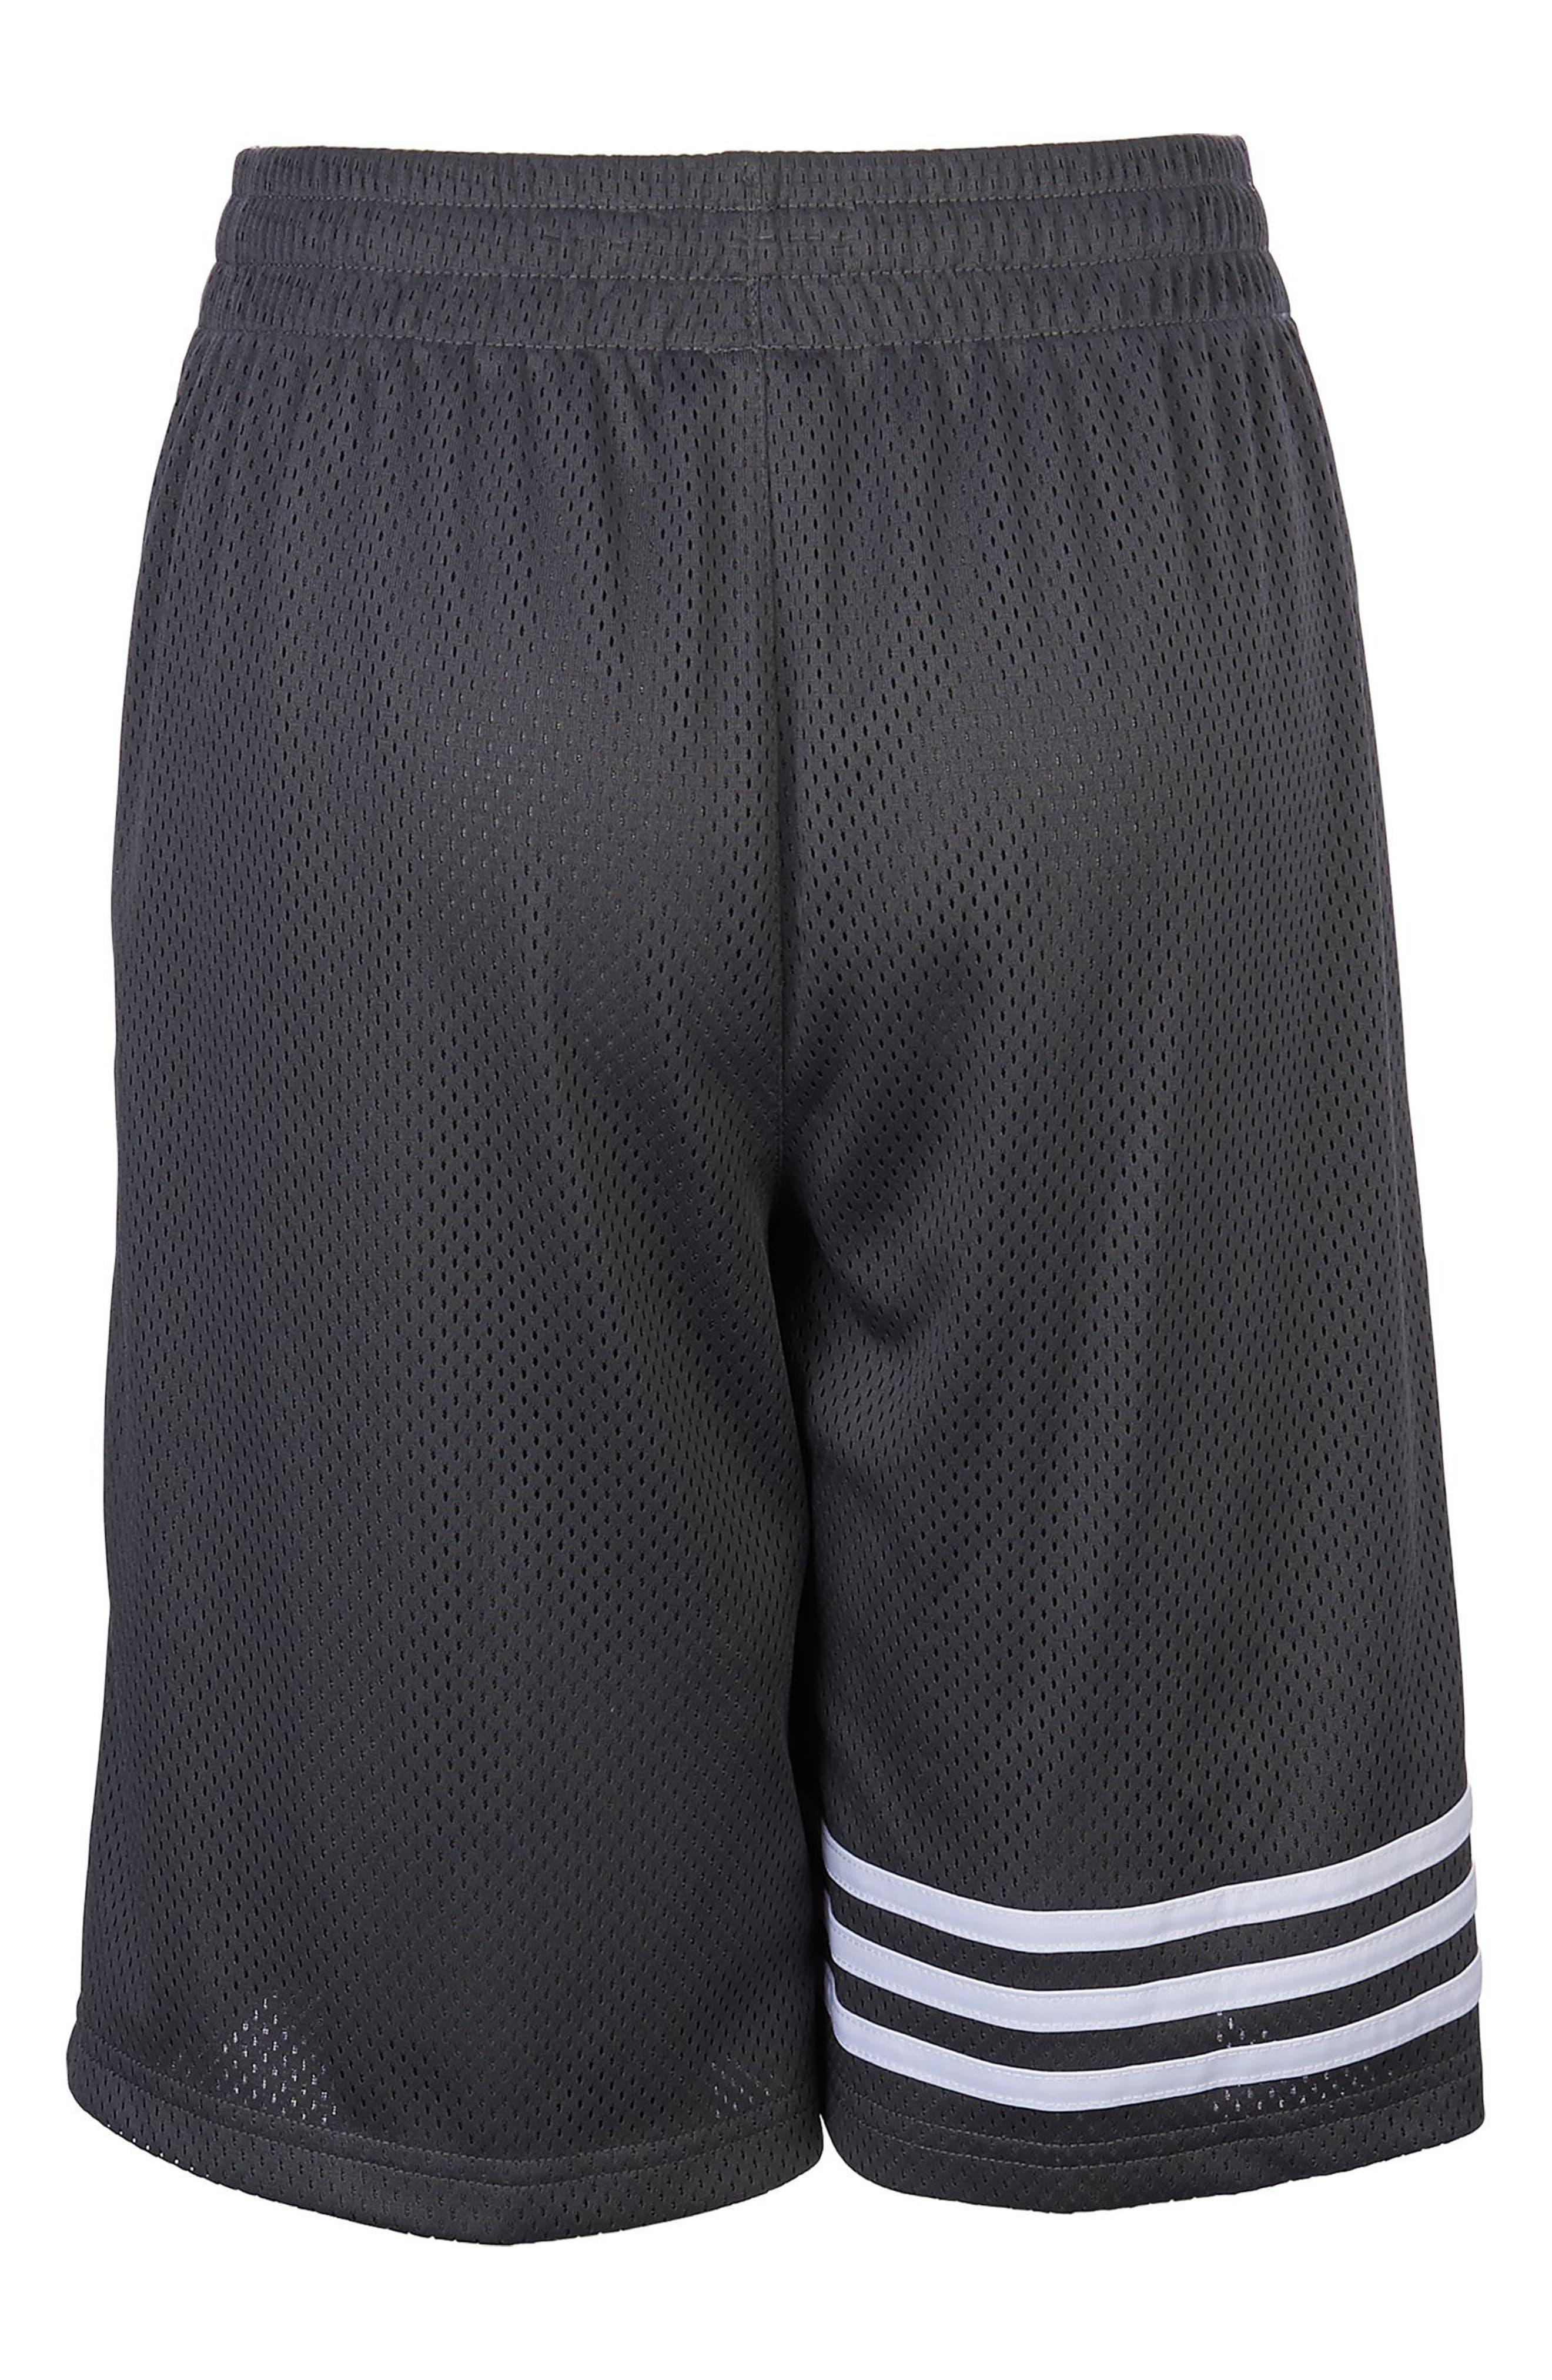 Replenishment Defender Shorts,                             Alternate thumbnail 5, color,